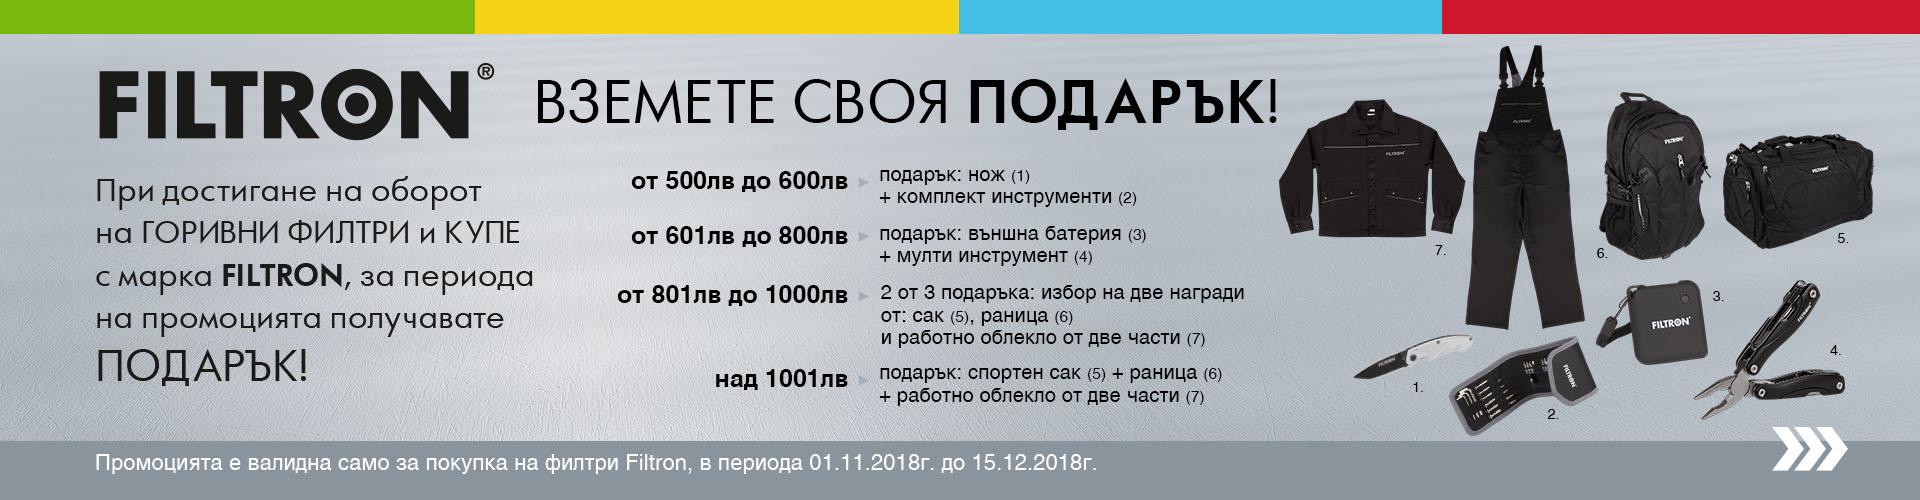 promocia_filtron_01.11.2018-15.12.2018_banner.jpg